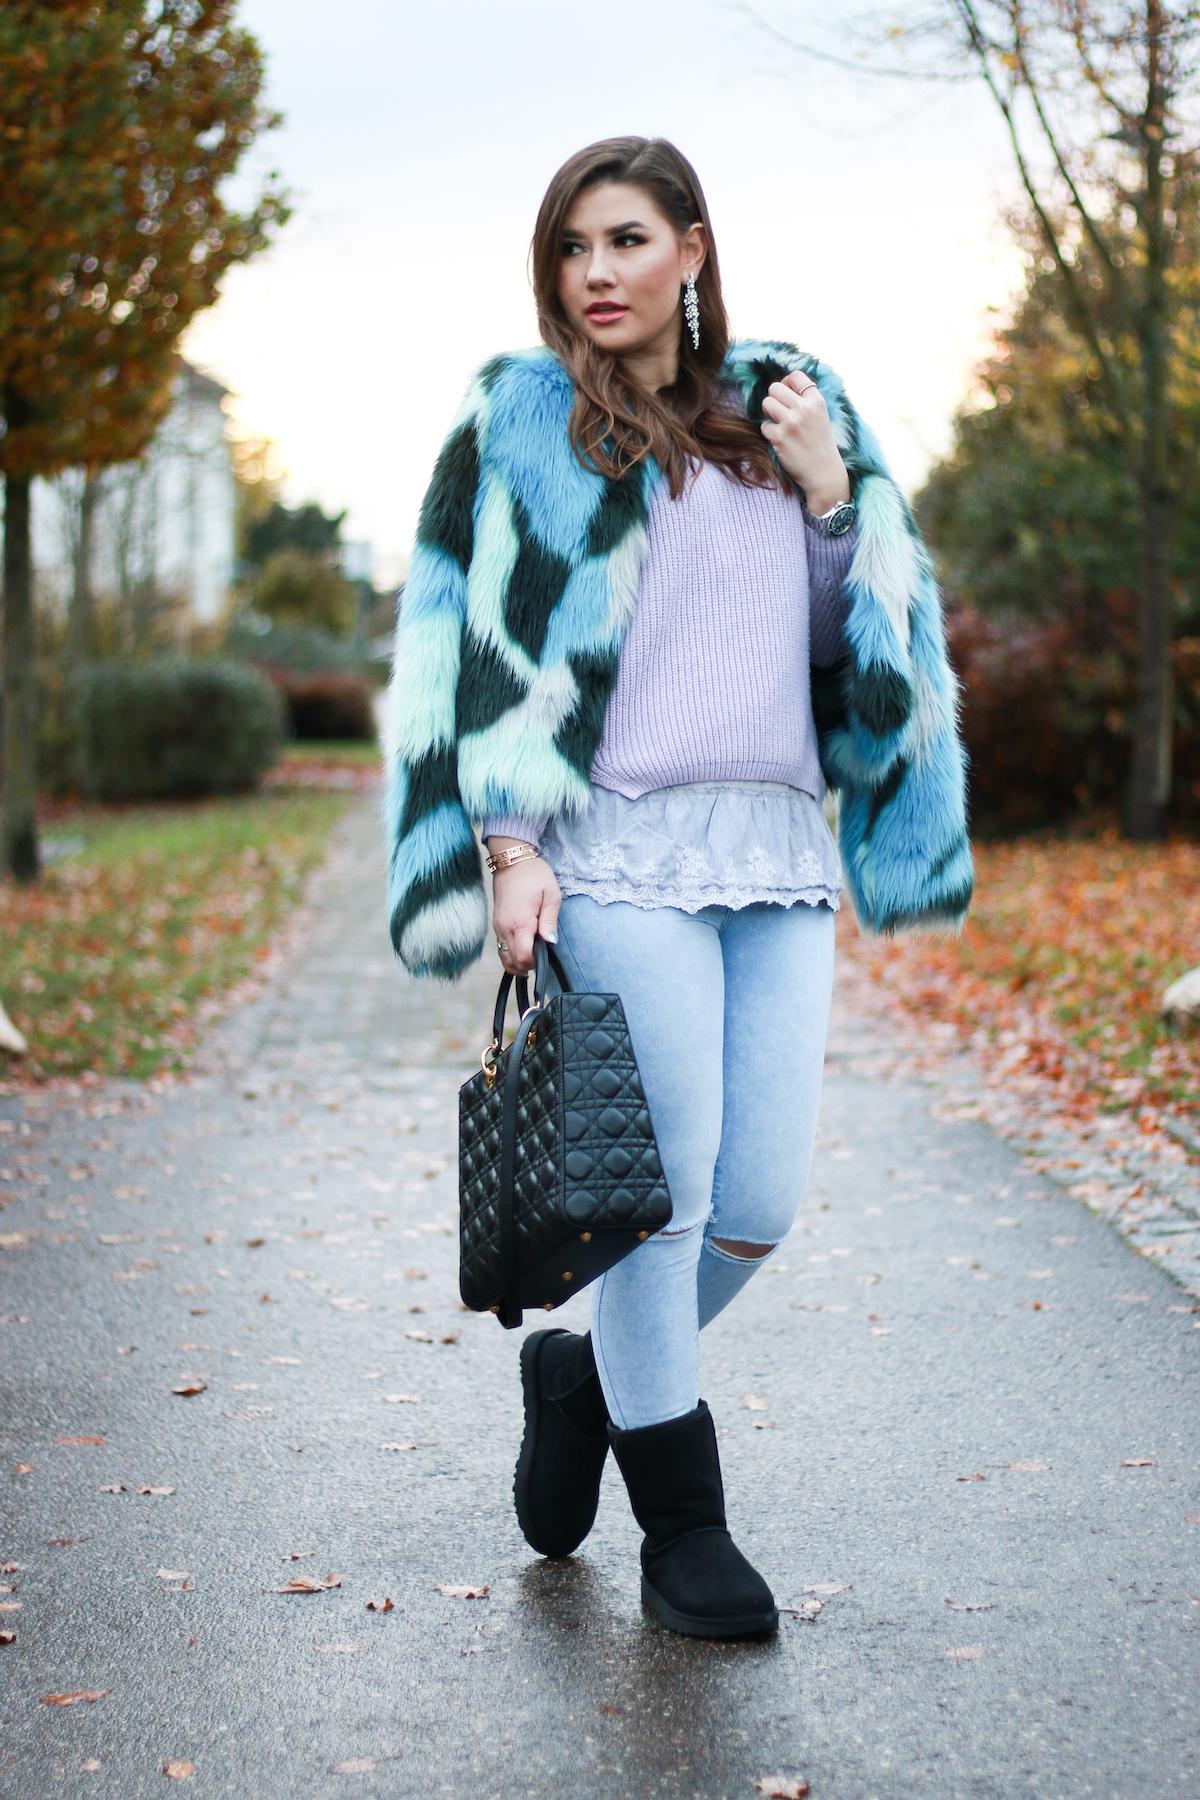 sara-bow-fashion-blogger-ugg-boots-outfit-schwarz